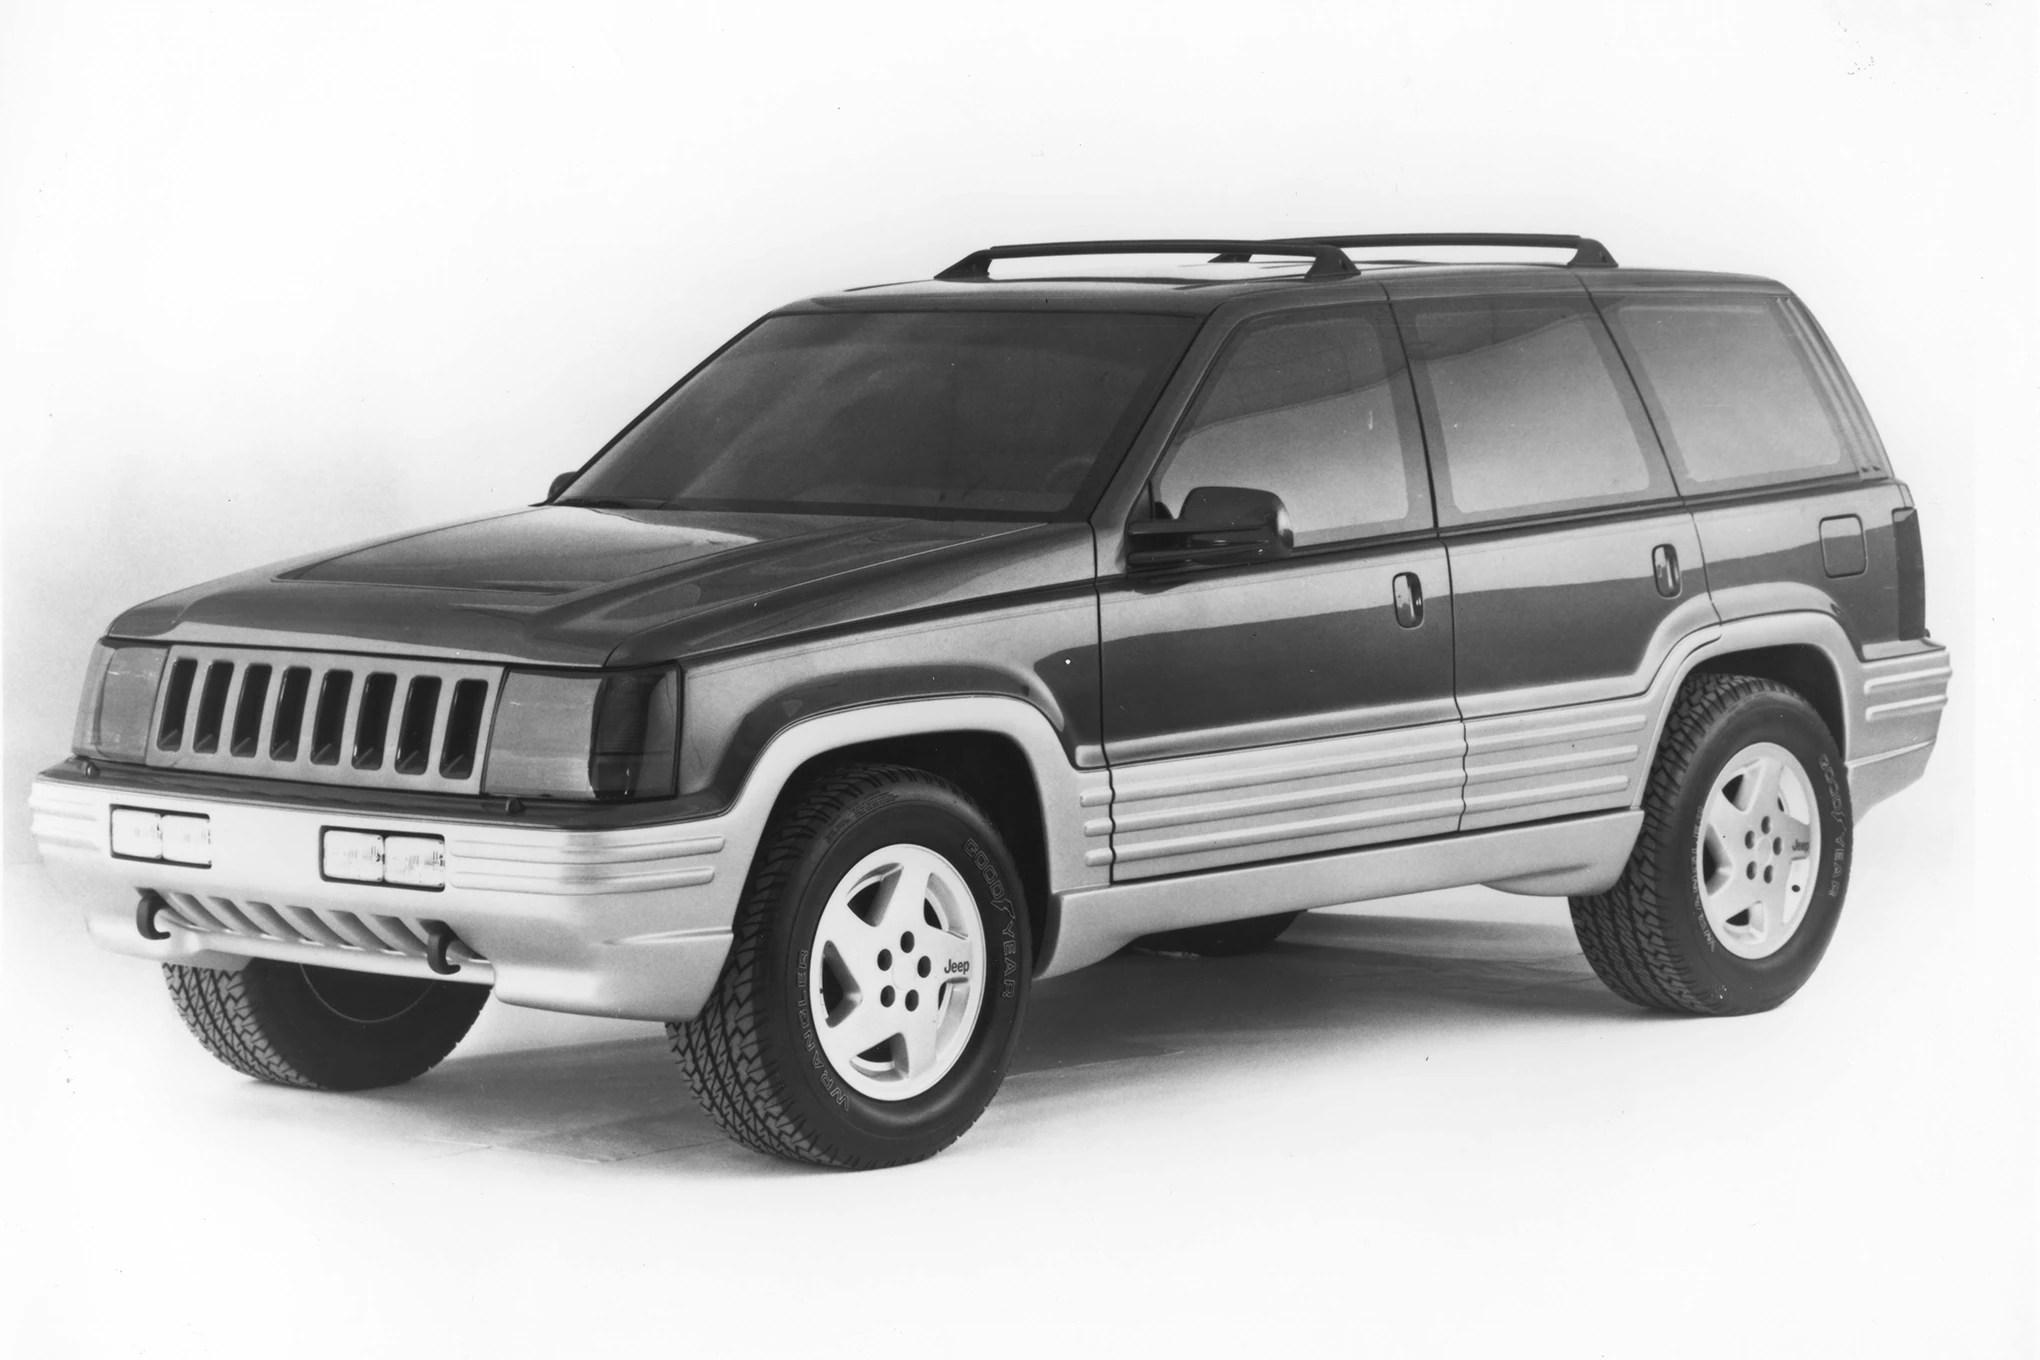 medium resolution of  011 1989 jeep concept 1 012 1993 jeep grand cherokee laredo